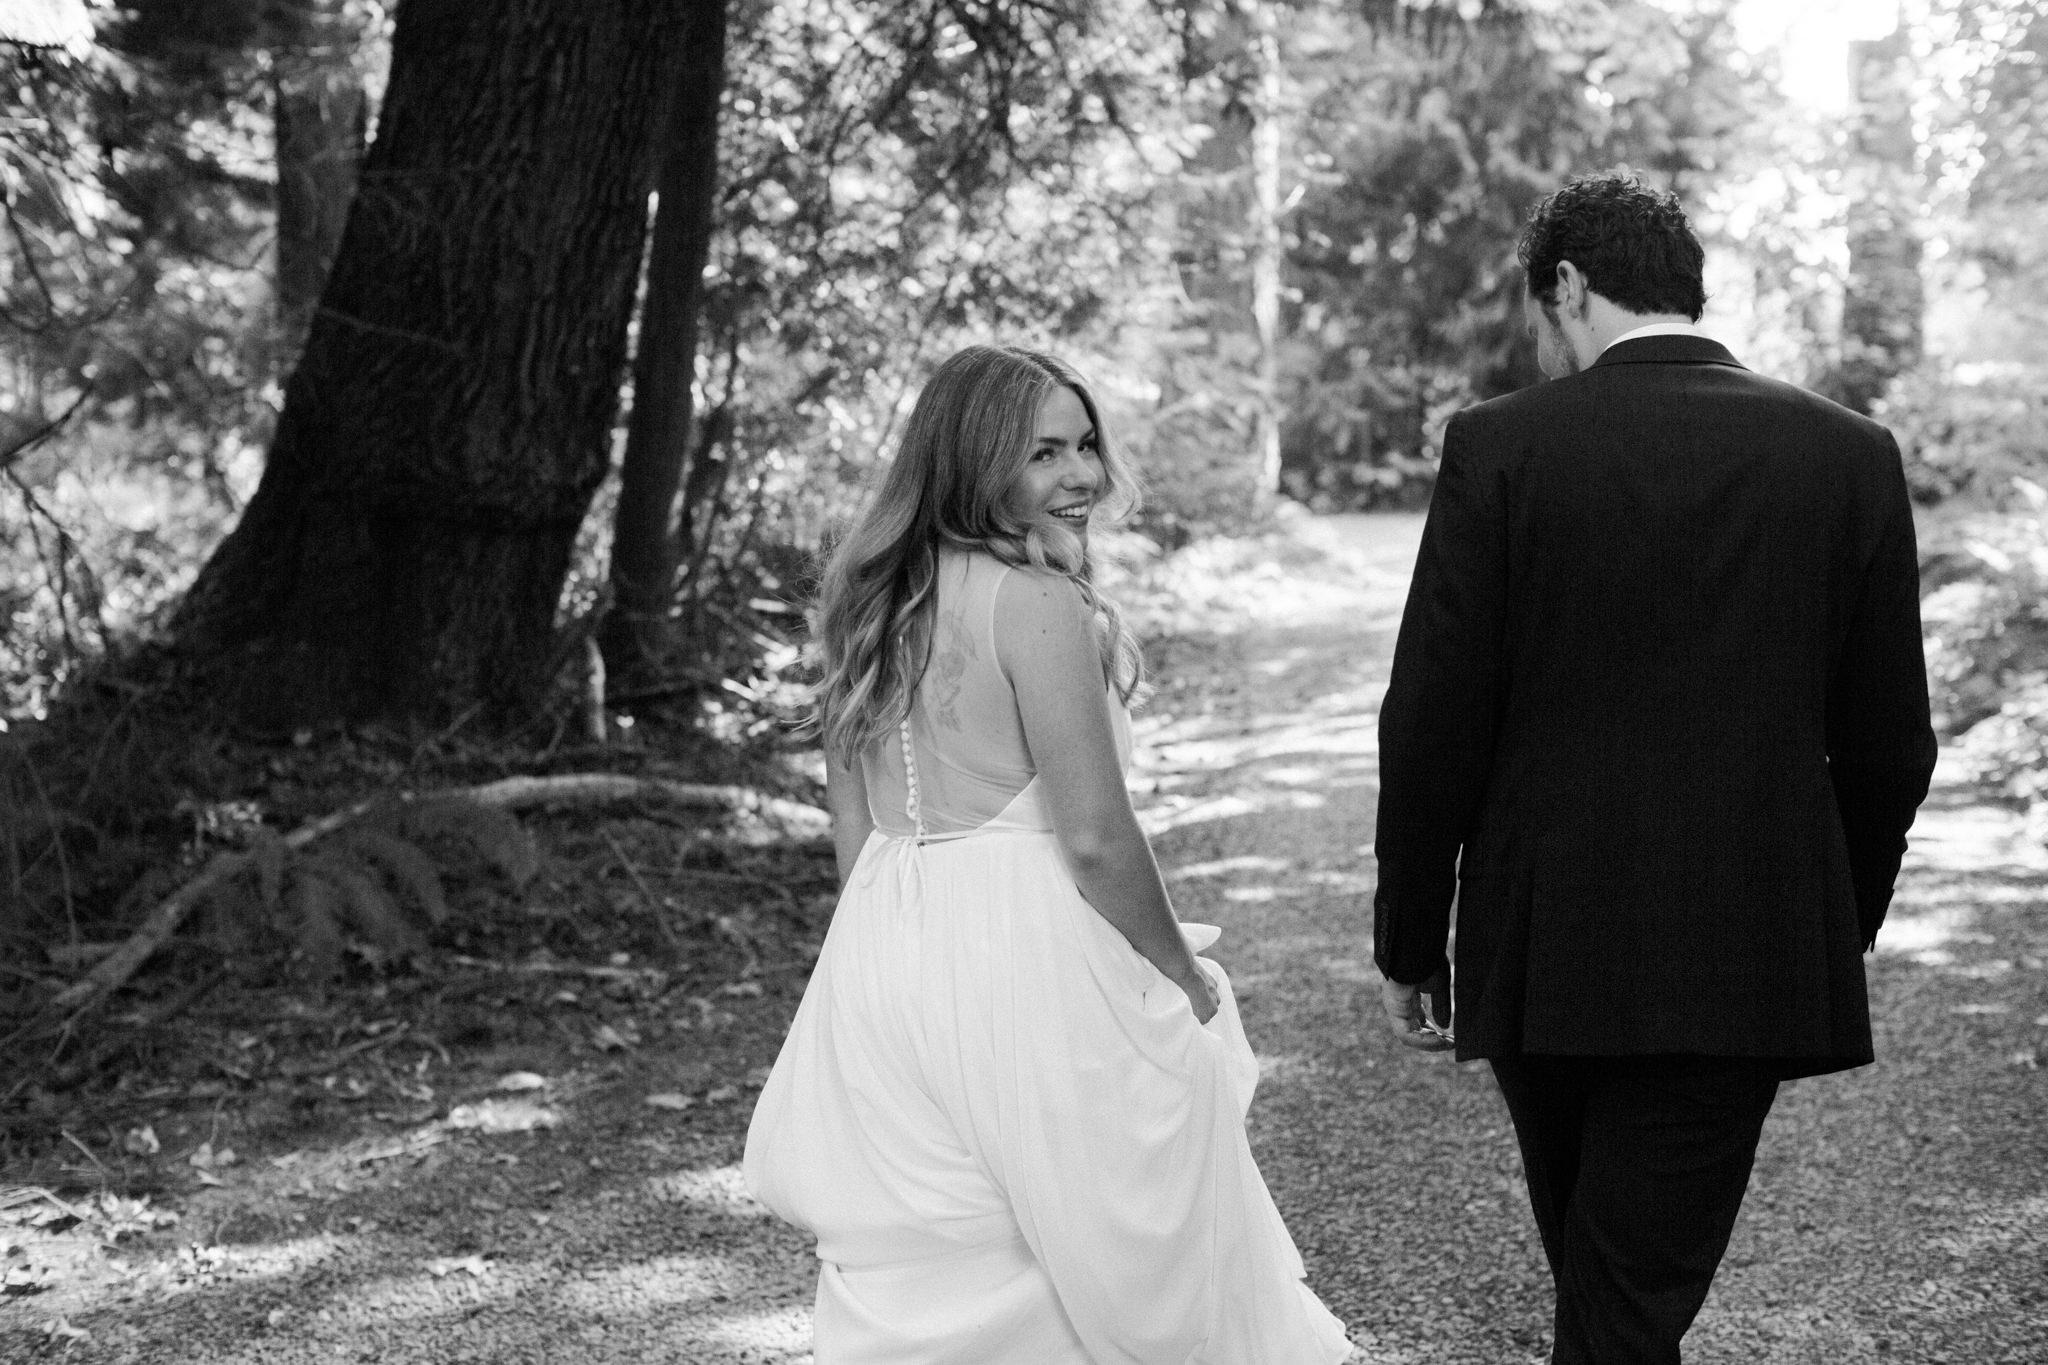 Backyard-Bainbridge-Island-Wedding-Alycia-Lovell-Photography-39.JPG